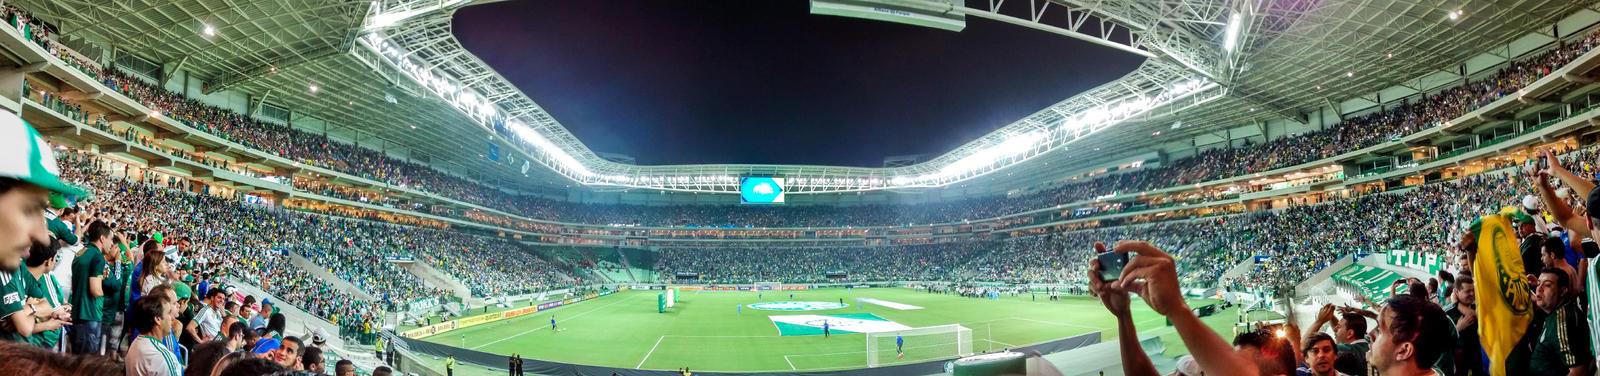 Allianz Parque Panoramica - Palmeiras